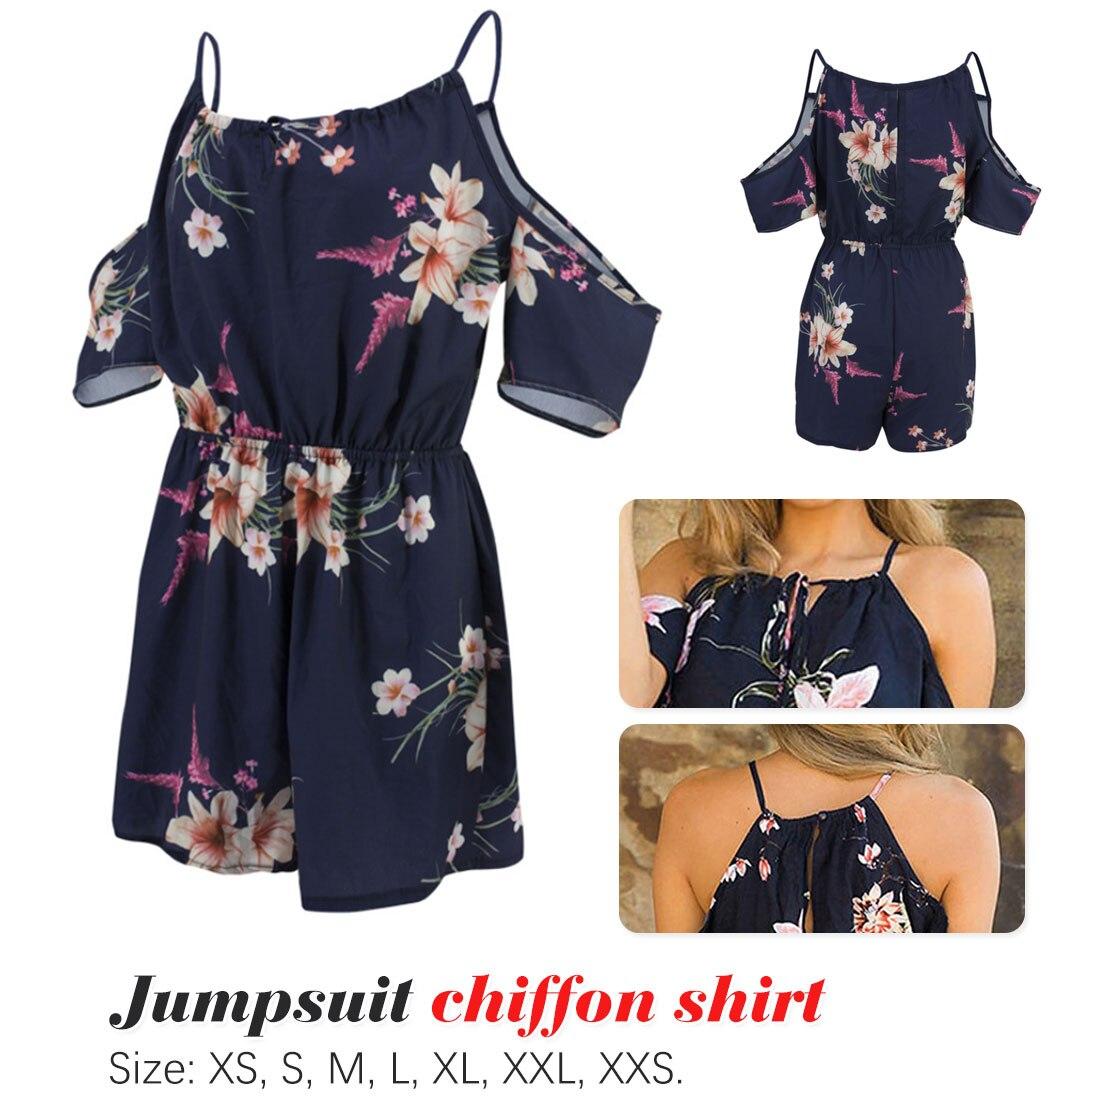 Backless Jumpsuit Summer Rompers Floral-Printed Bohemian Beach-Bodycon Ladie-Shoulder